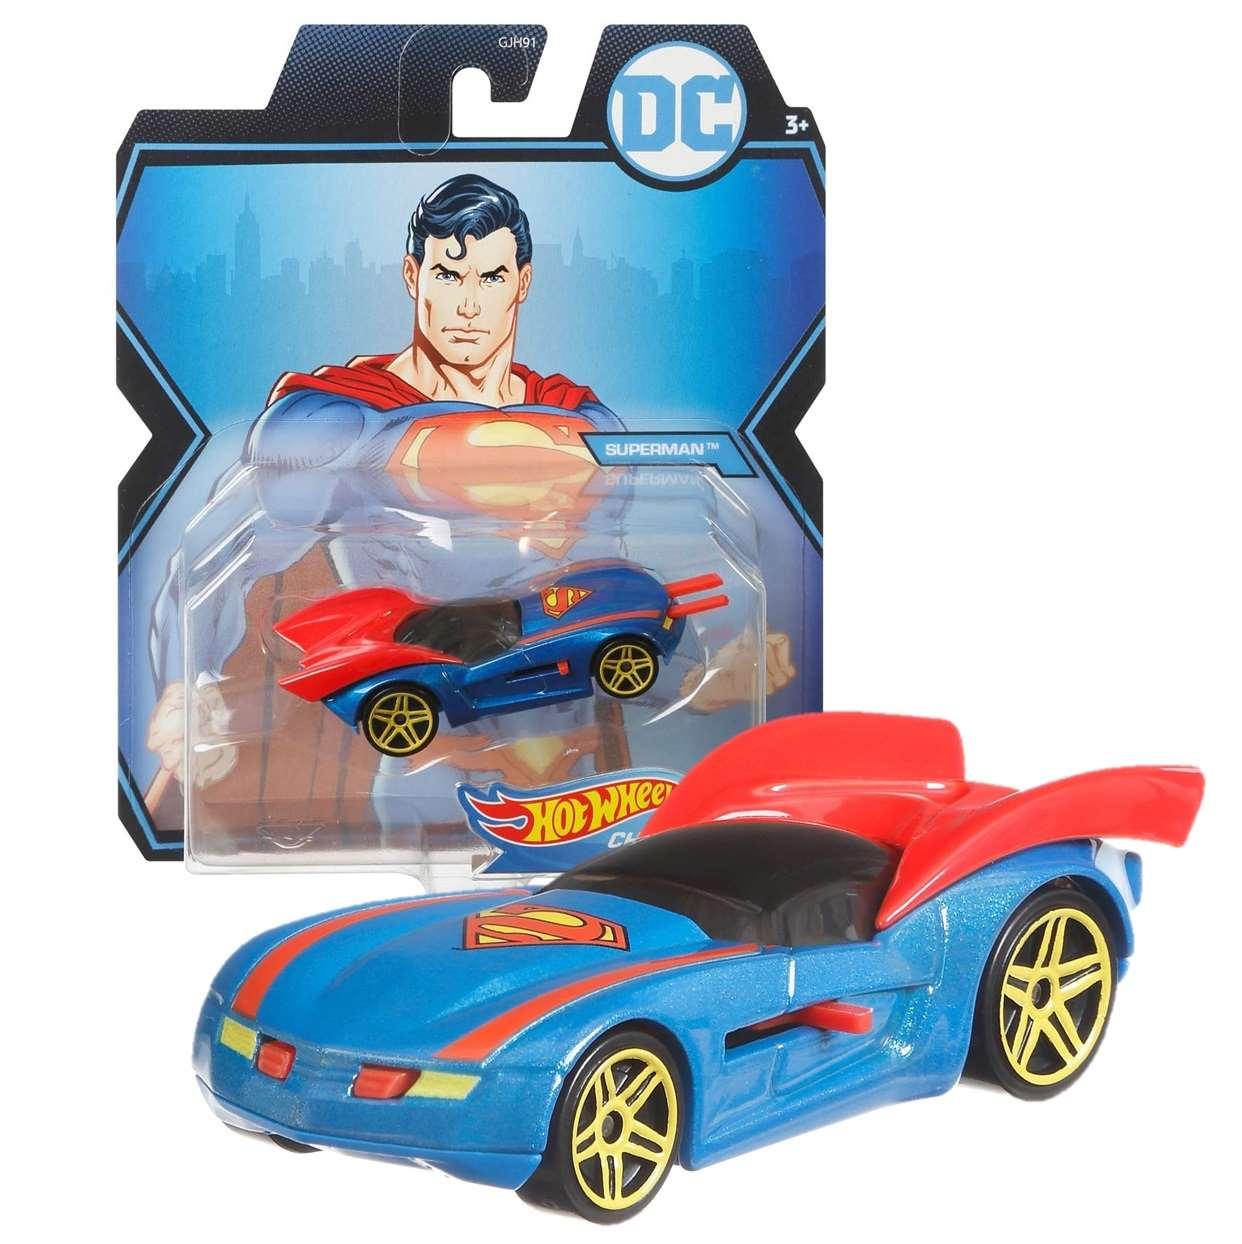 Superman Gmh96 Hot Wheels Character Cars Die Cast